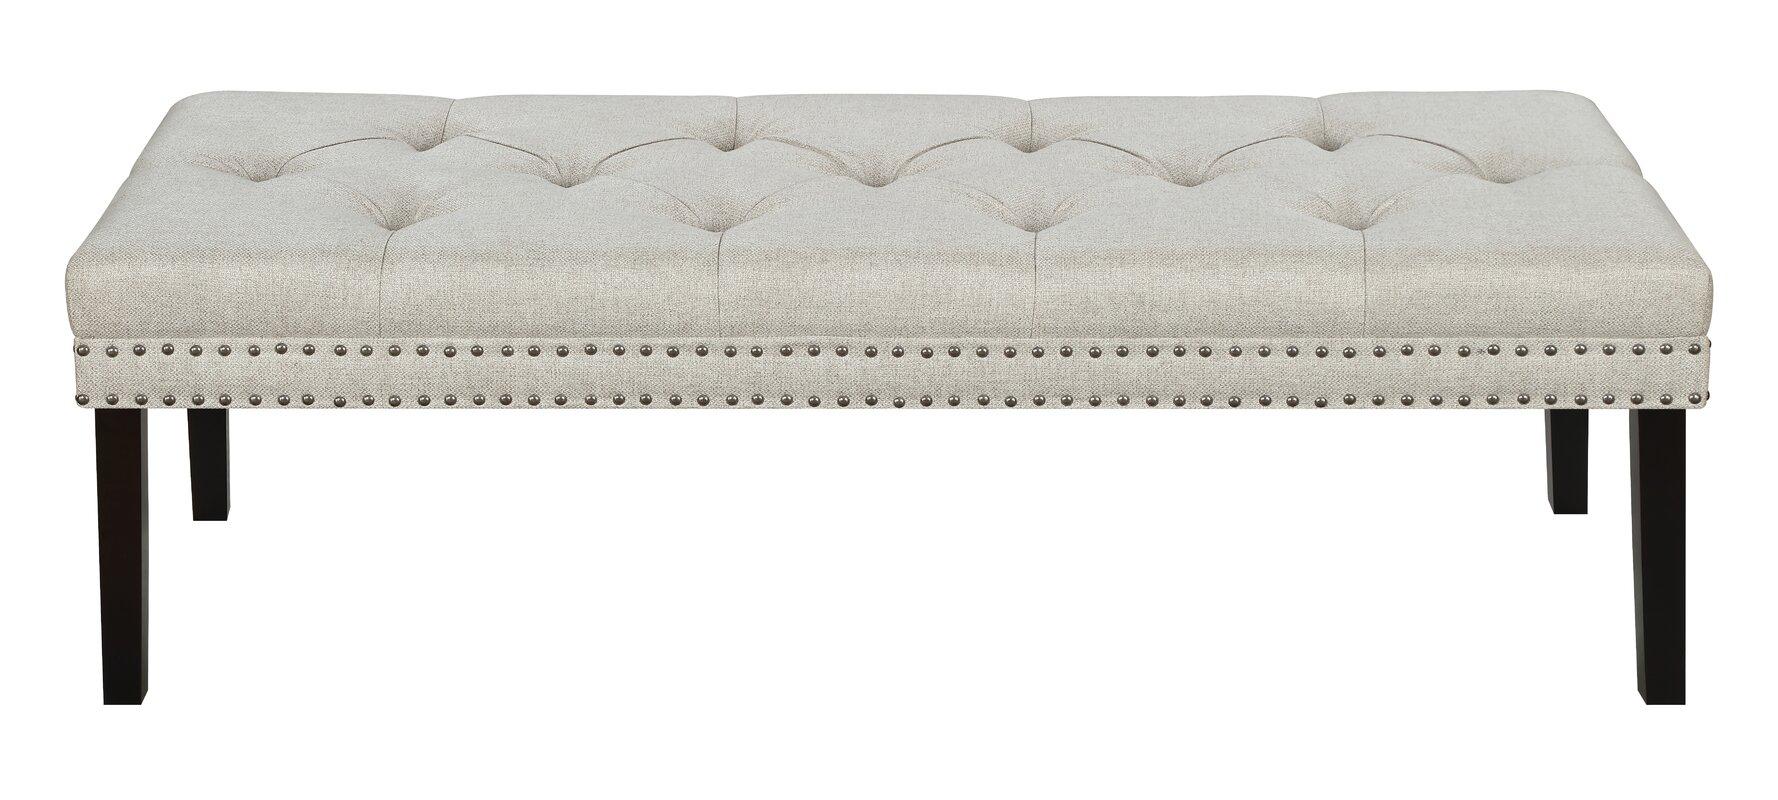 charlton home roxie upholstered bedroom bench  reviews  wayfair - defaultname